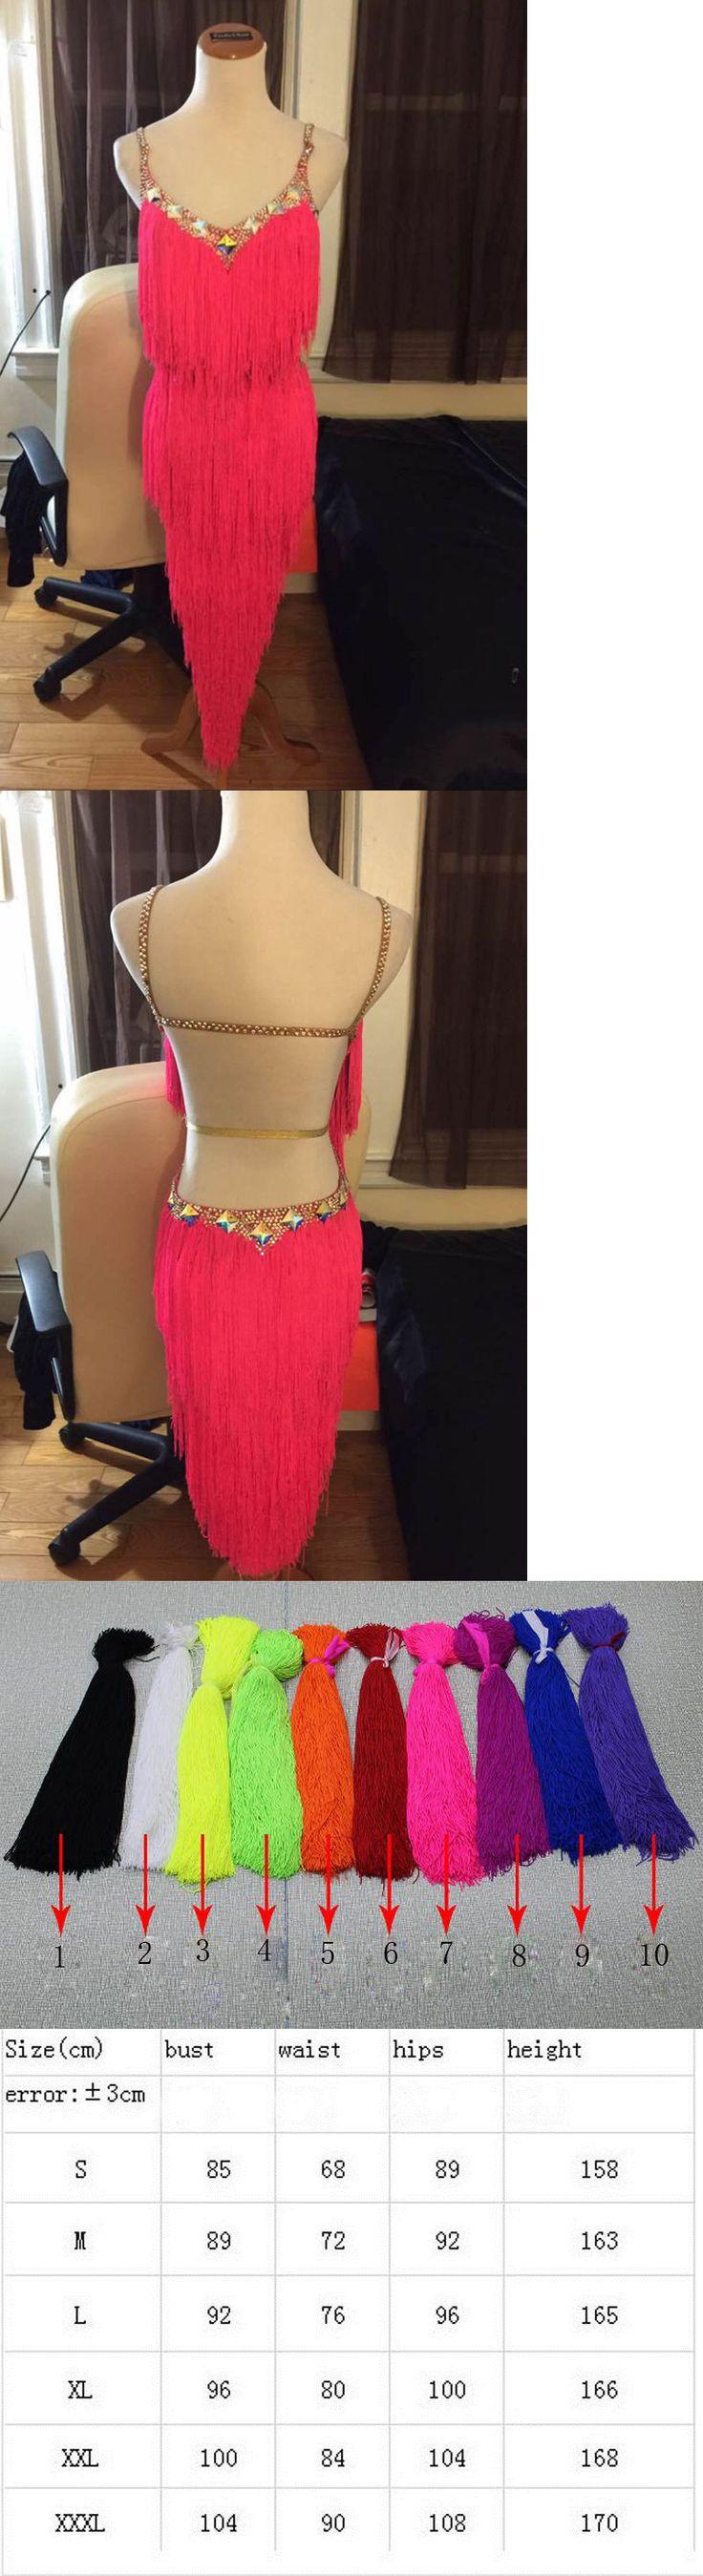 Dancewear: Tassel Latin Dance Salsa Tango Cha Cha Ballroom Rhinestone Competition Dresses -> BUY IT NOW ONLY: $79.99 on eBay!